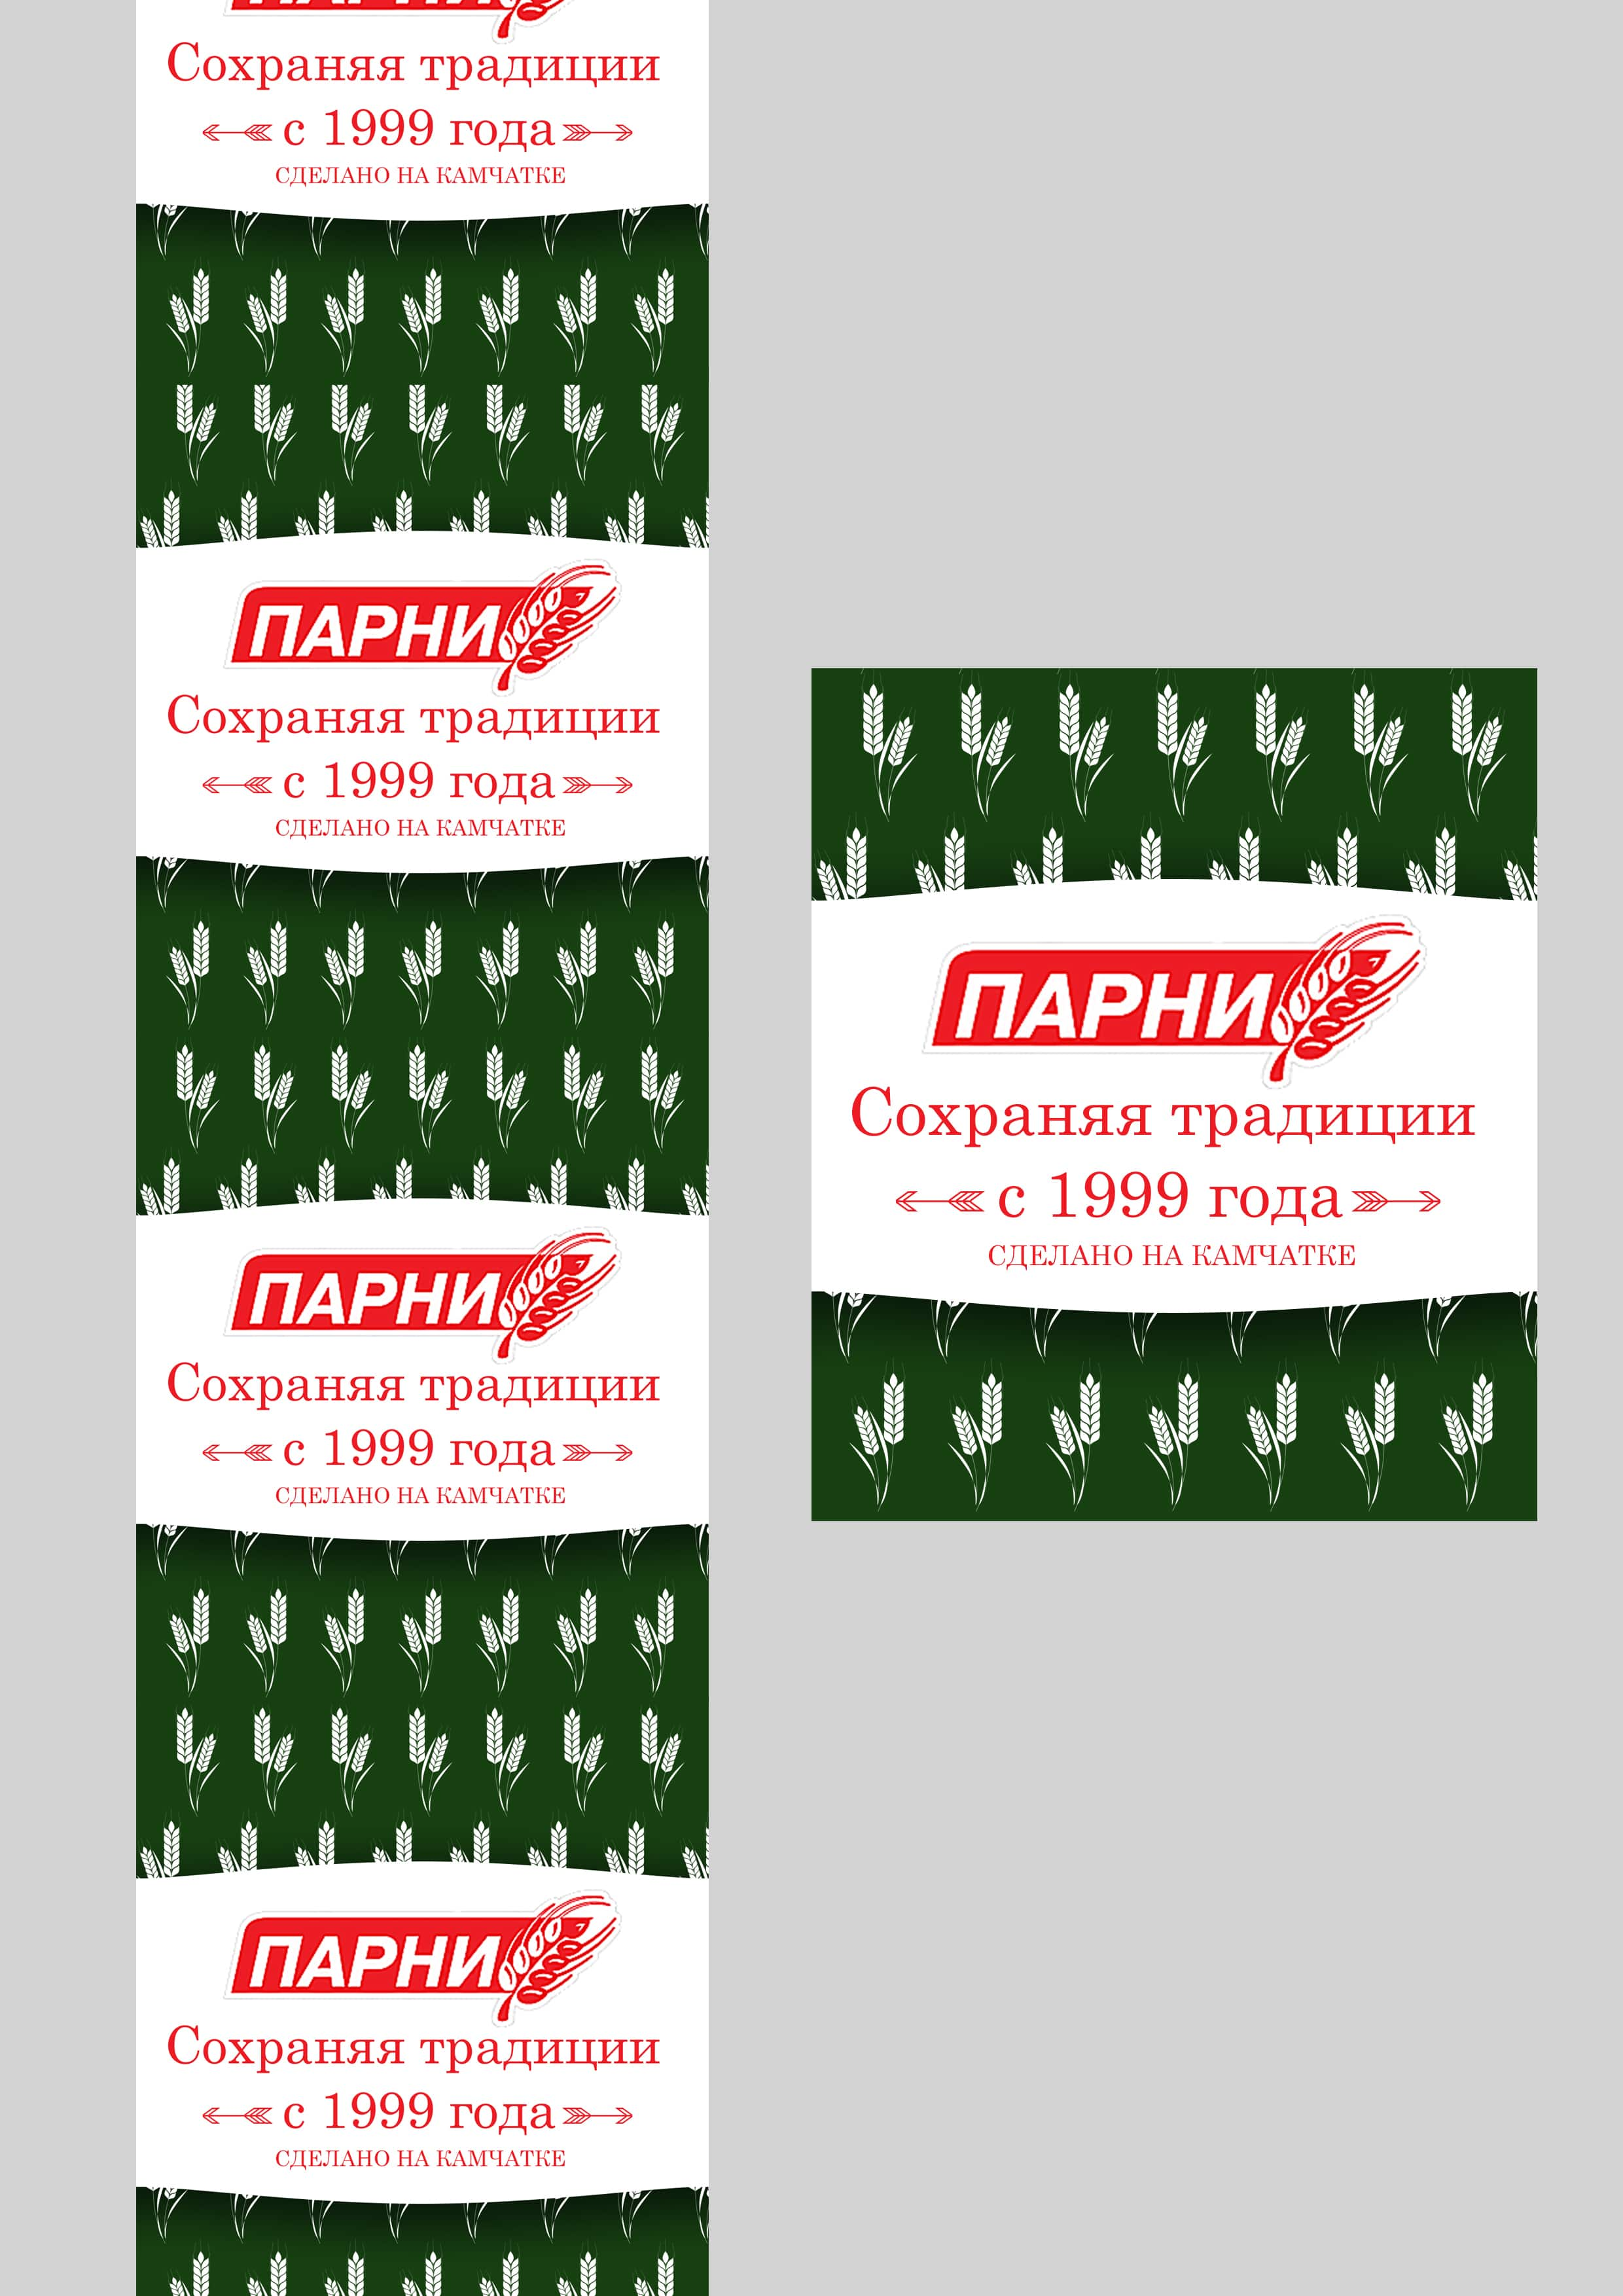 Дизайн упаковки для хлеба и батона фото f_1415d015608a74e0.jpg